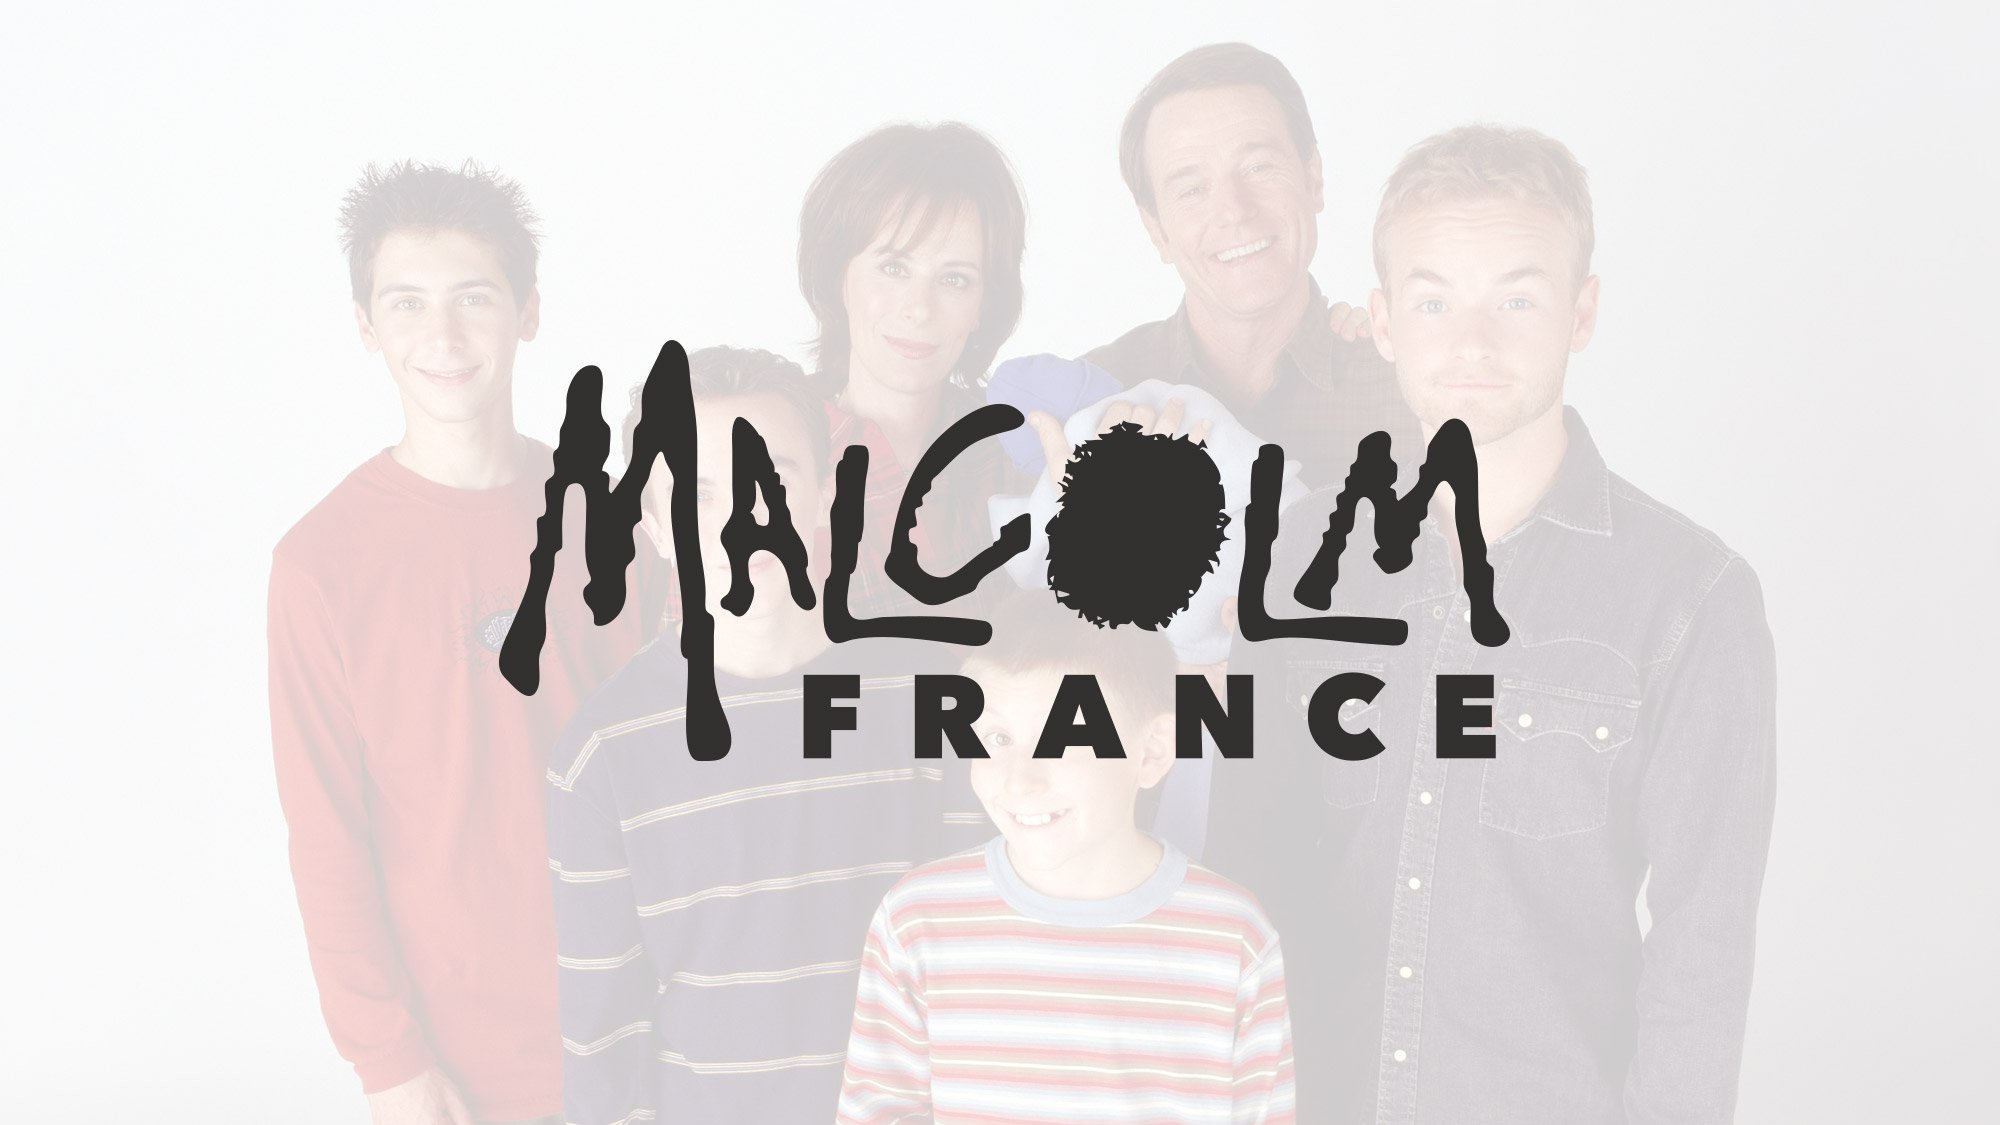 Malcolm France.